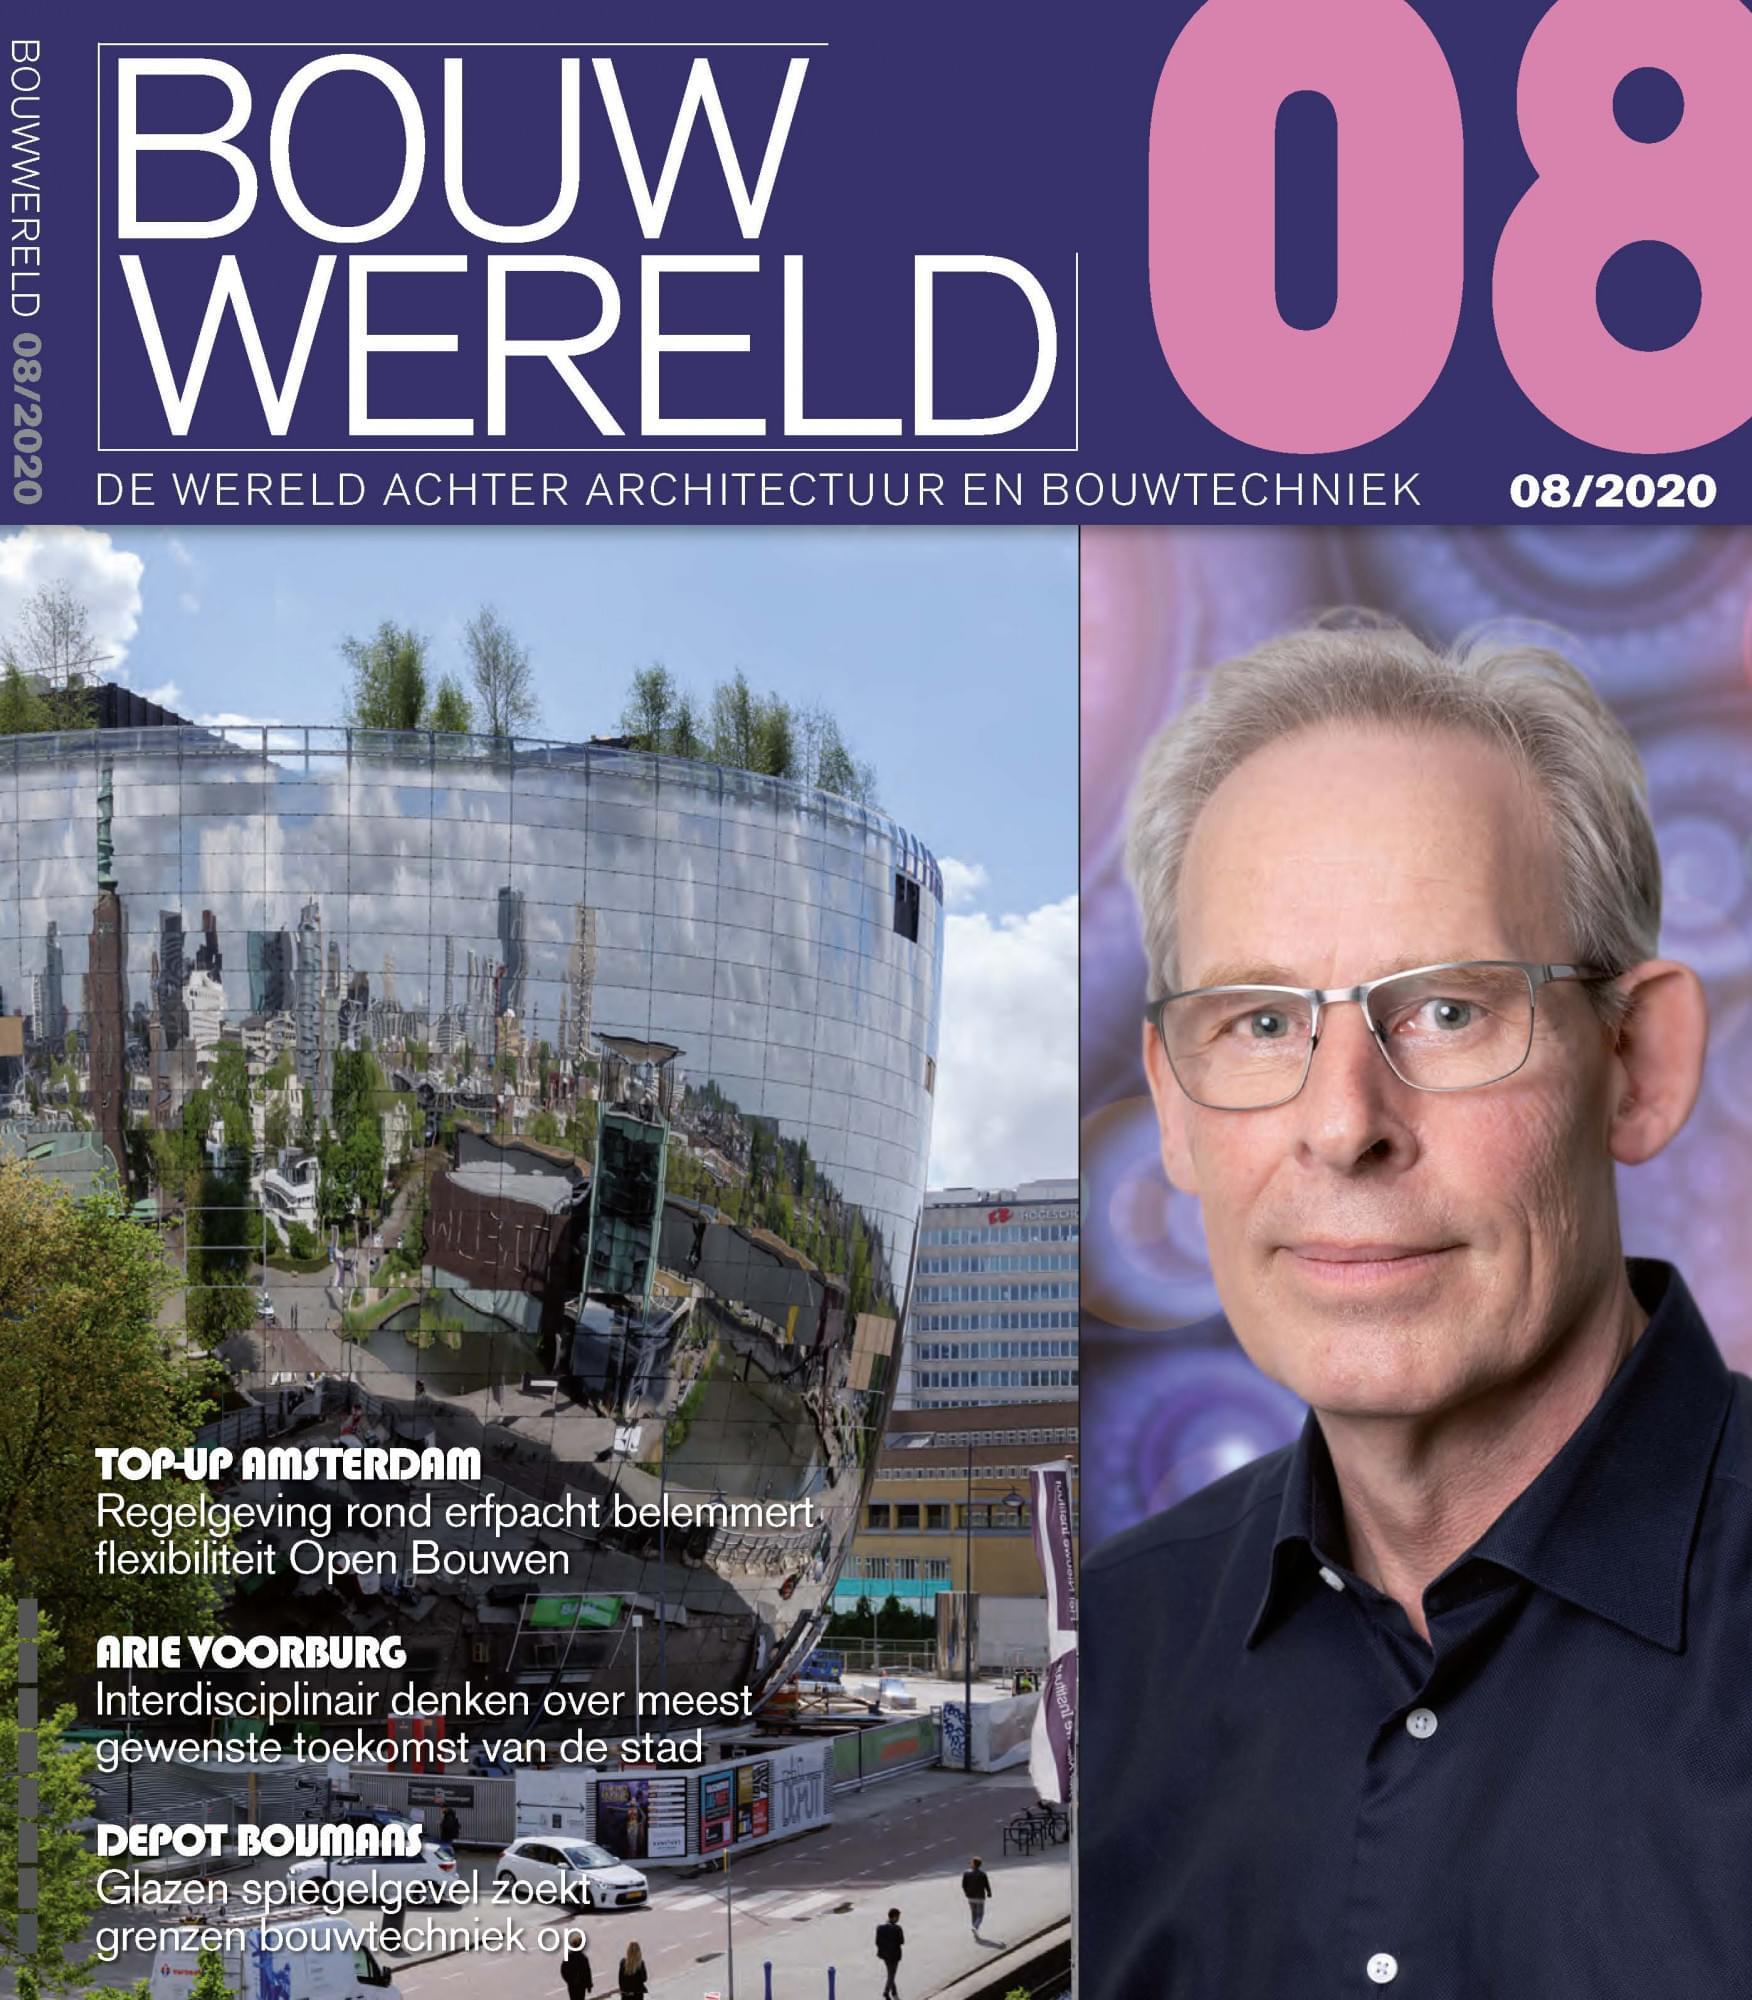 Bouwwereld 8 2020 crux Biesbosch 225_Page_1